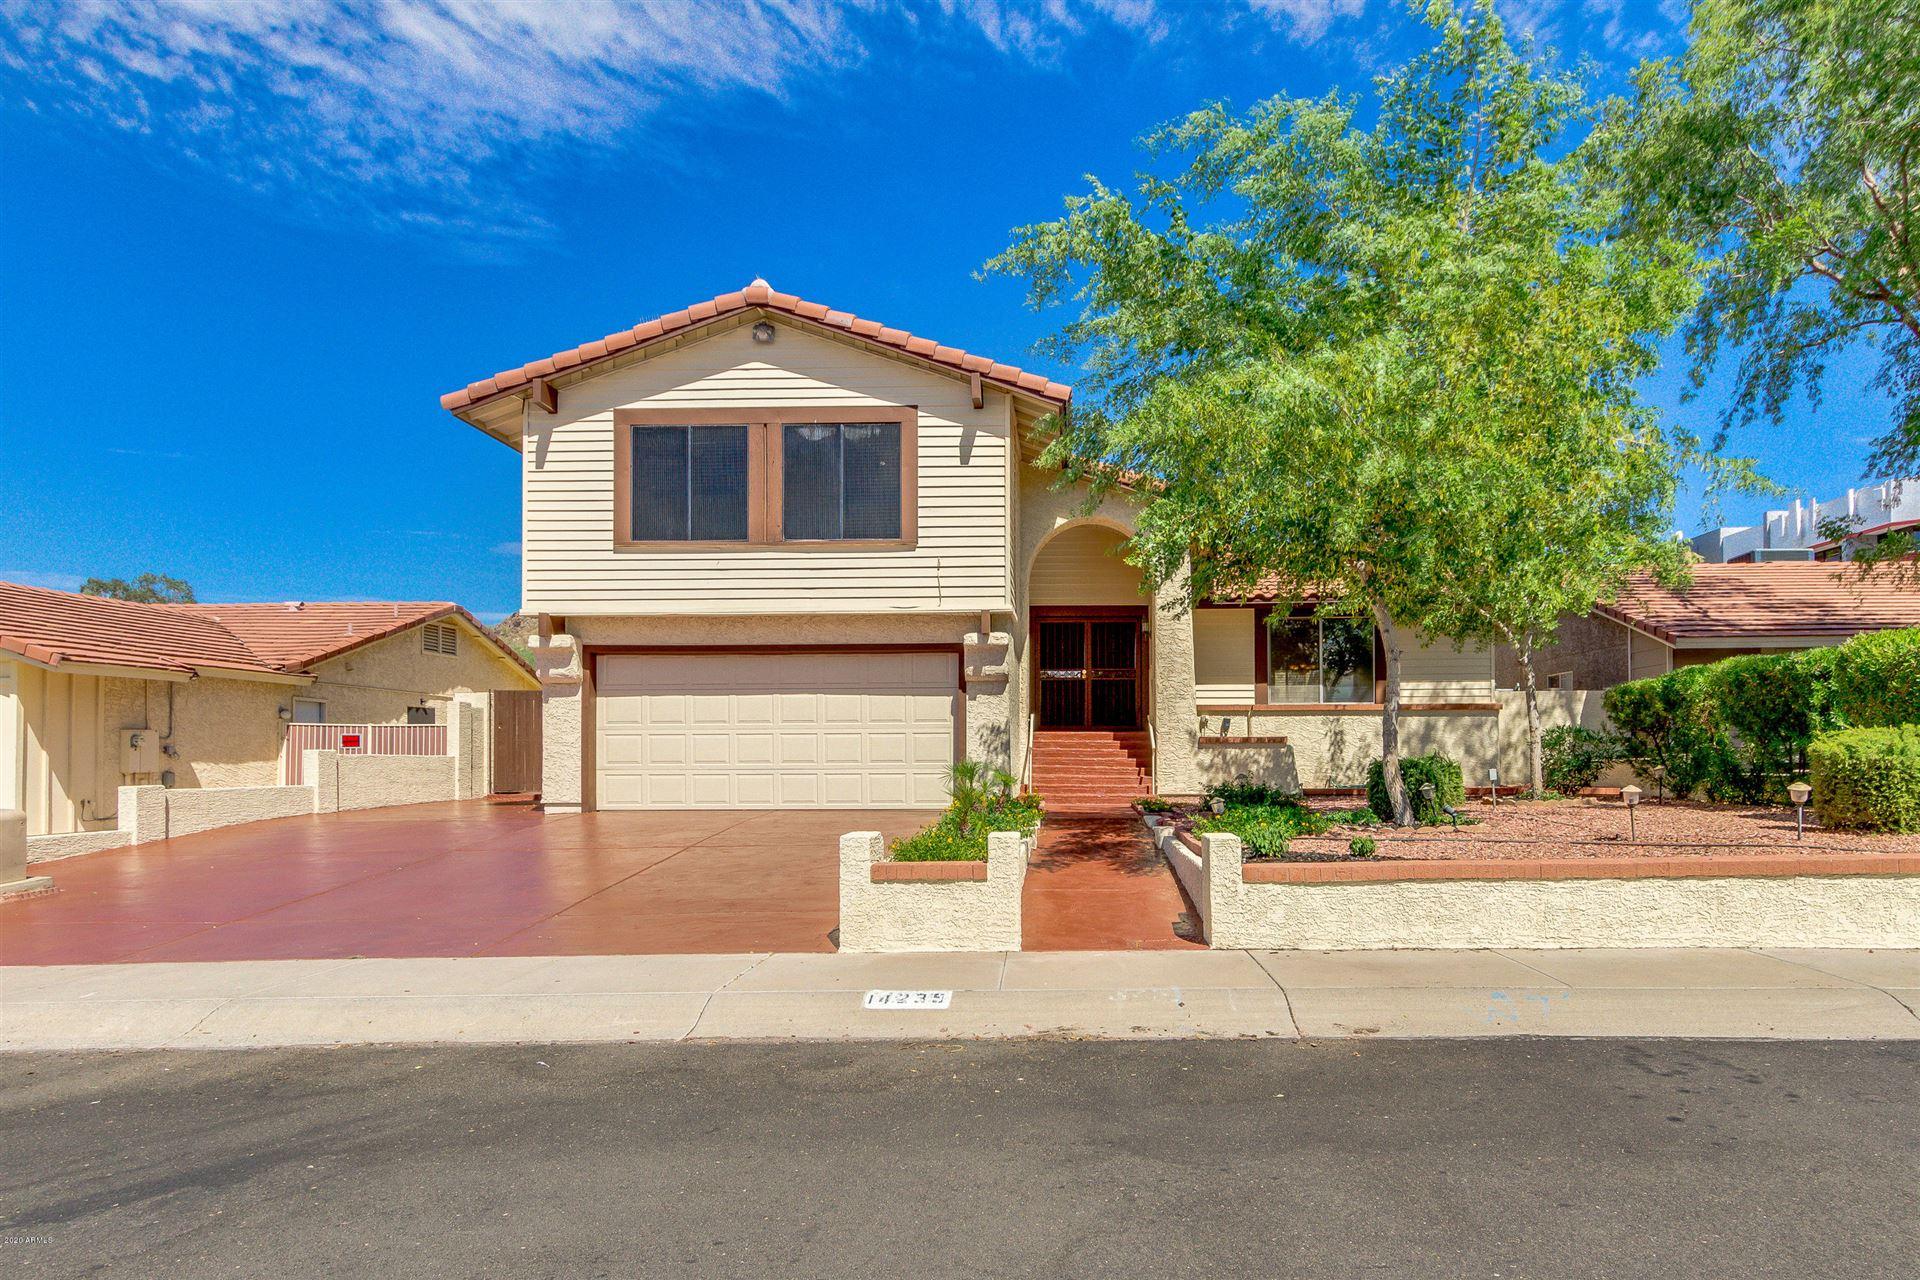 14239 N 22ND Street, Phoenix, AZ 85022 - #: 6096212